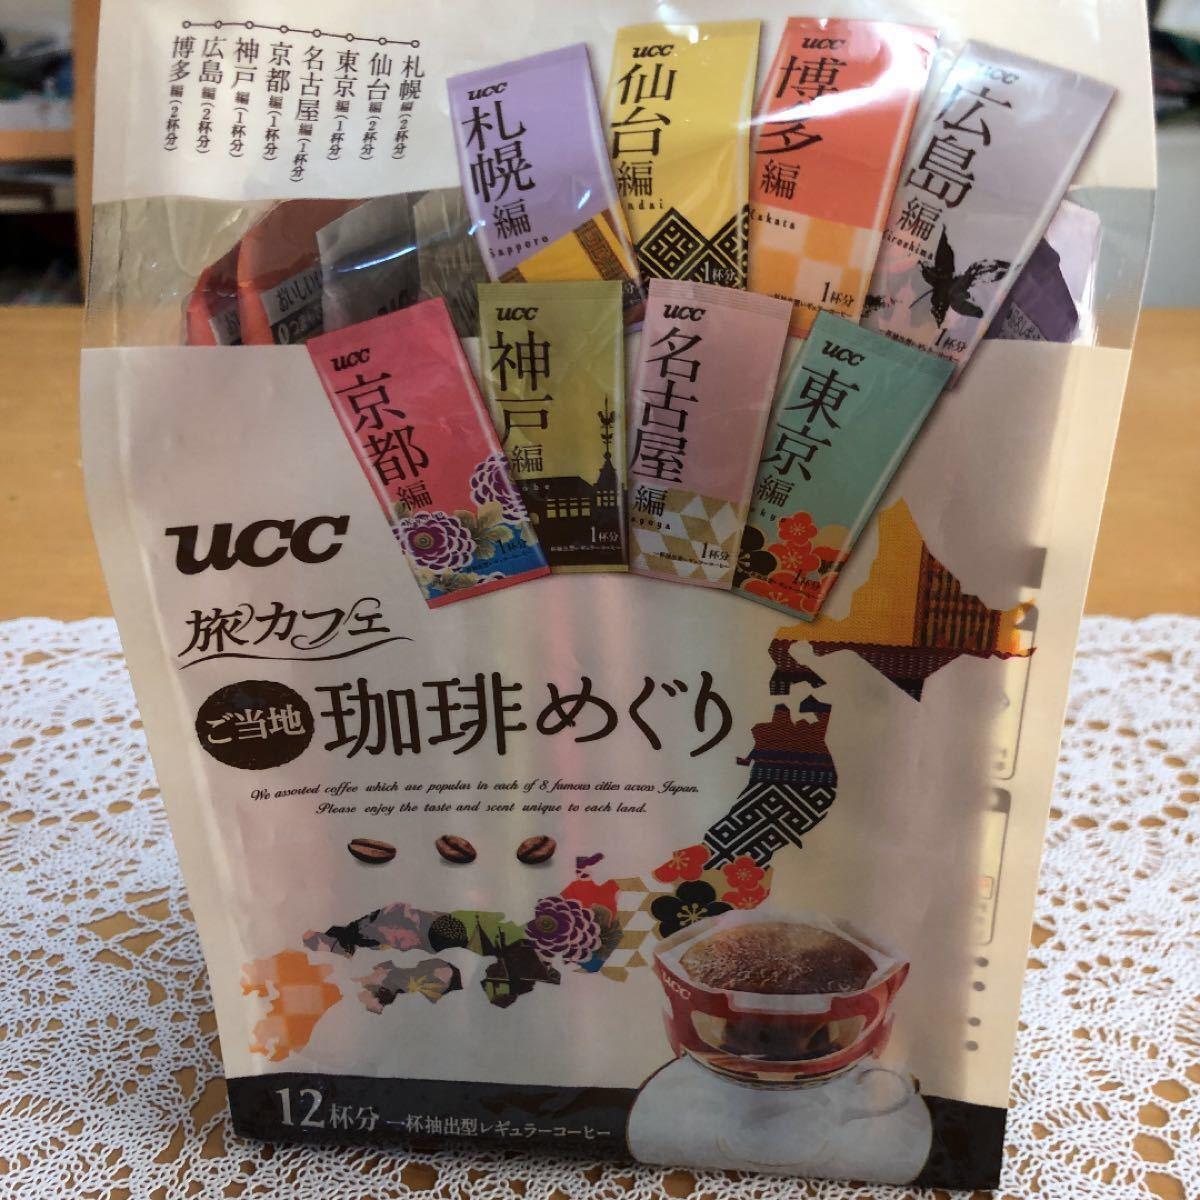 UCCコーヒー旅カフェ ご当地めぐり12袋